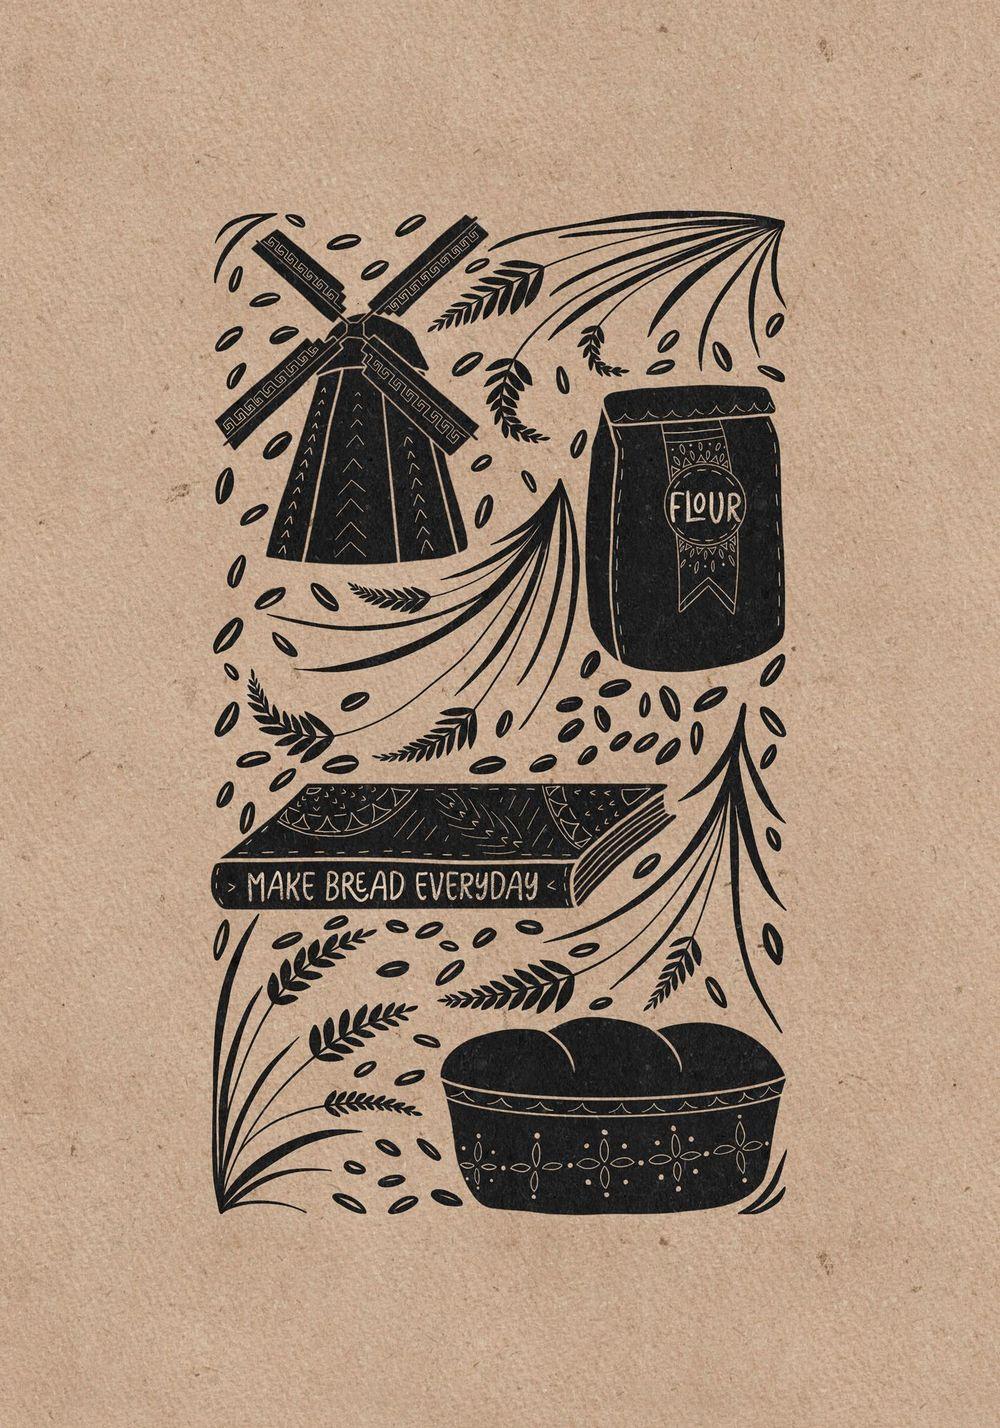 Moth folk illustration - image 2 - student project